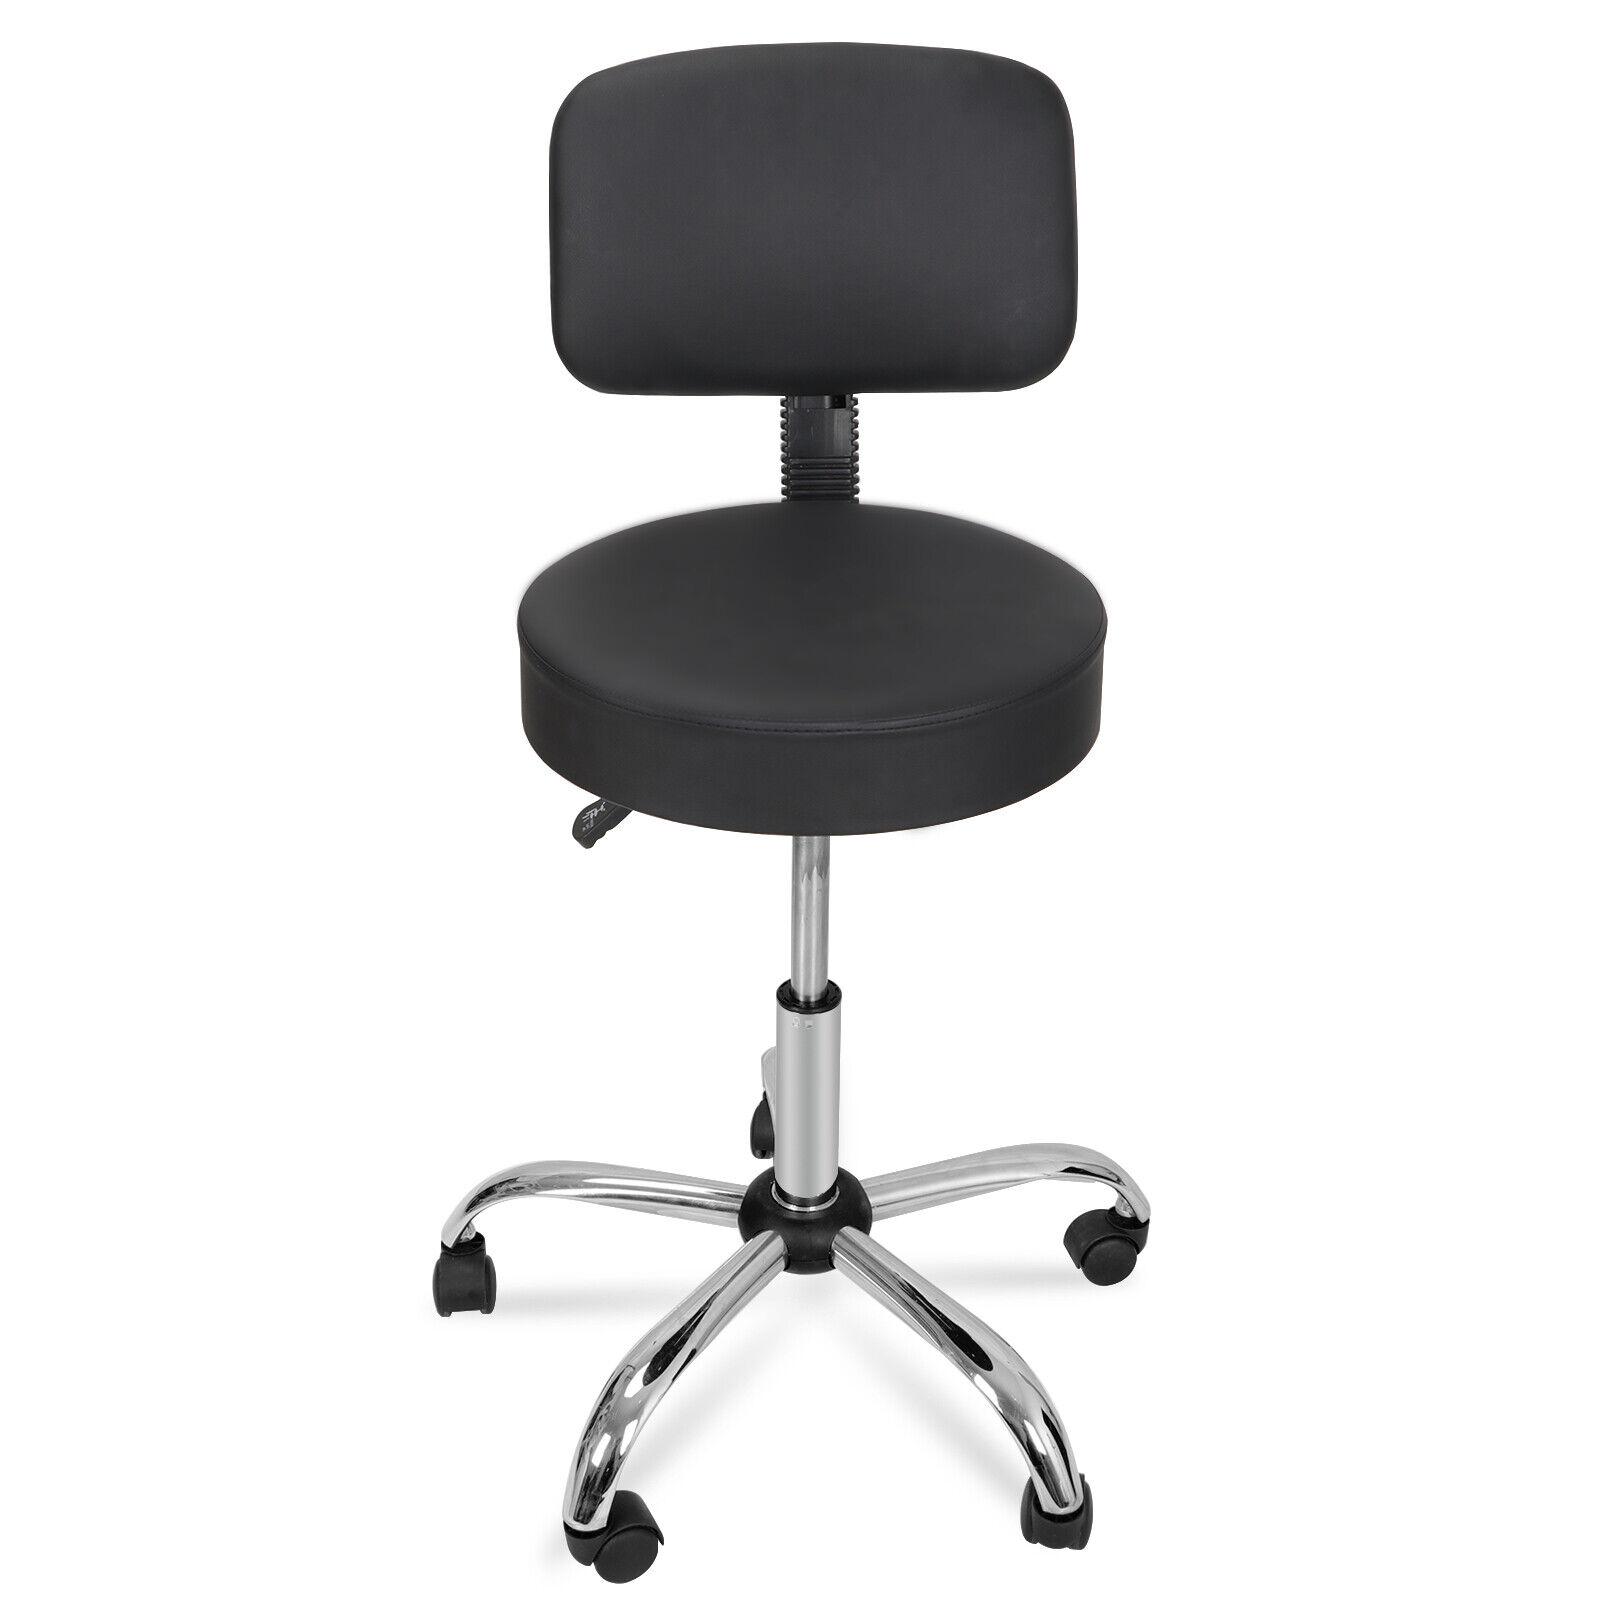 Salon Stool Chair Adjustable Height w/ Back Rest Black Hydraulic Rolling Swivel Health & Beauty